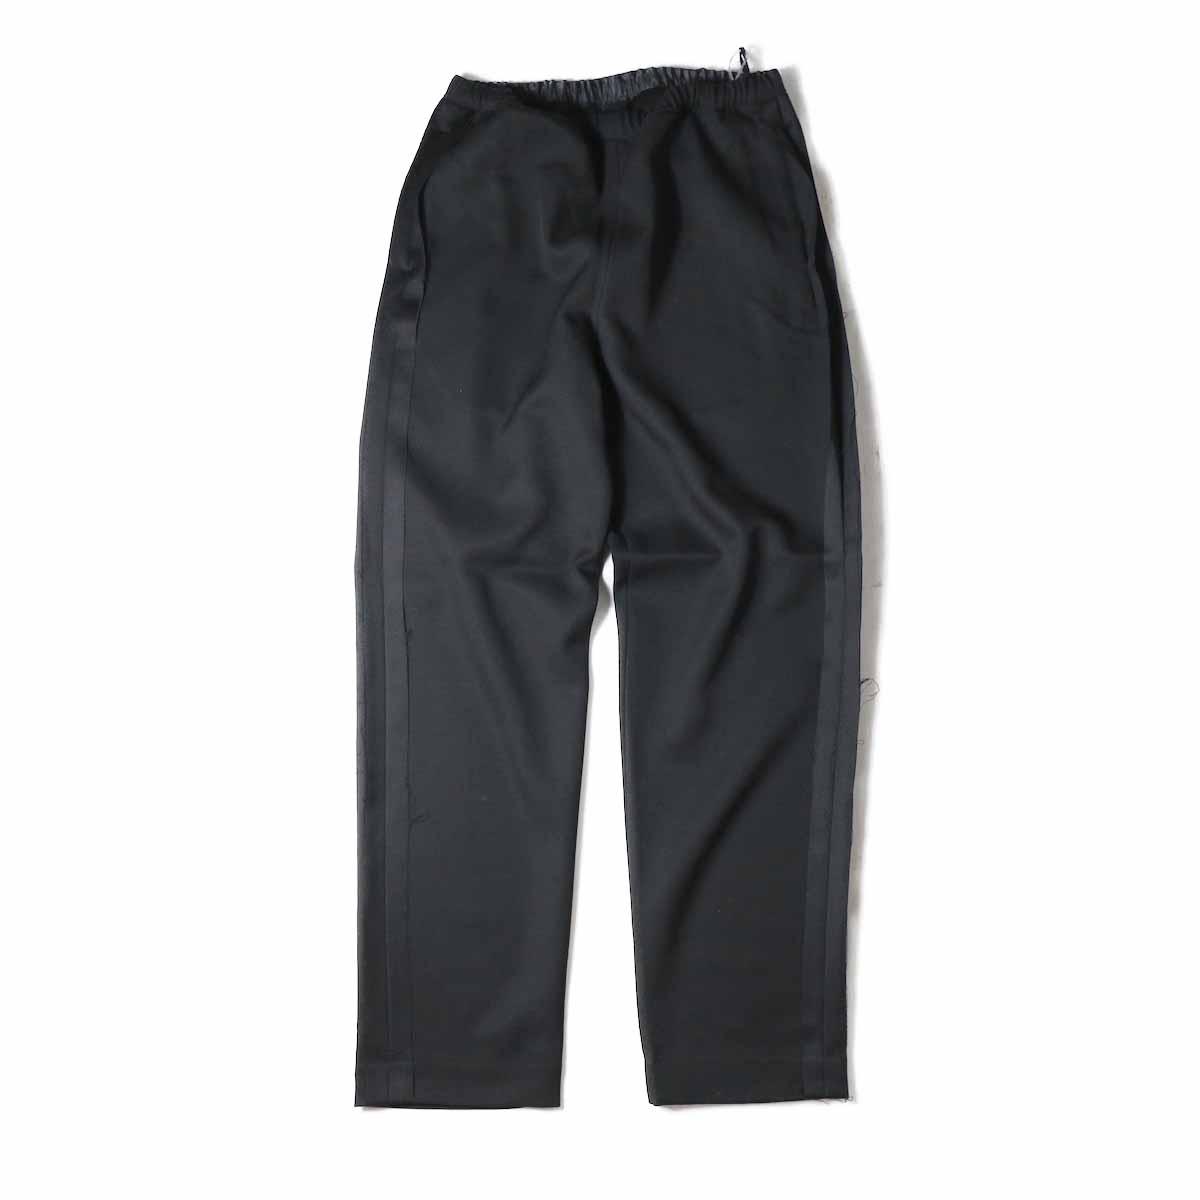 UNUSED / UW0689 Wool Easy Pant -BLACK